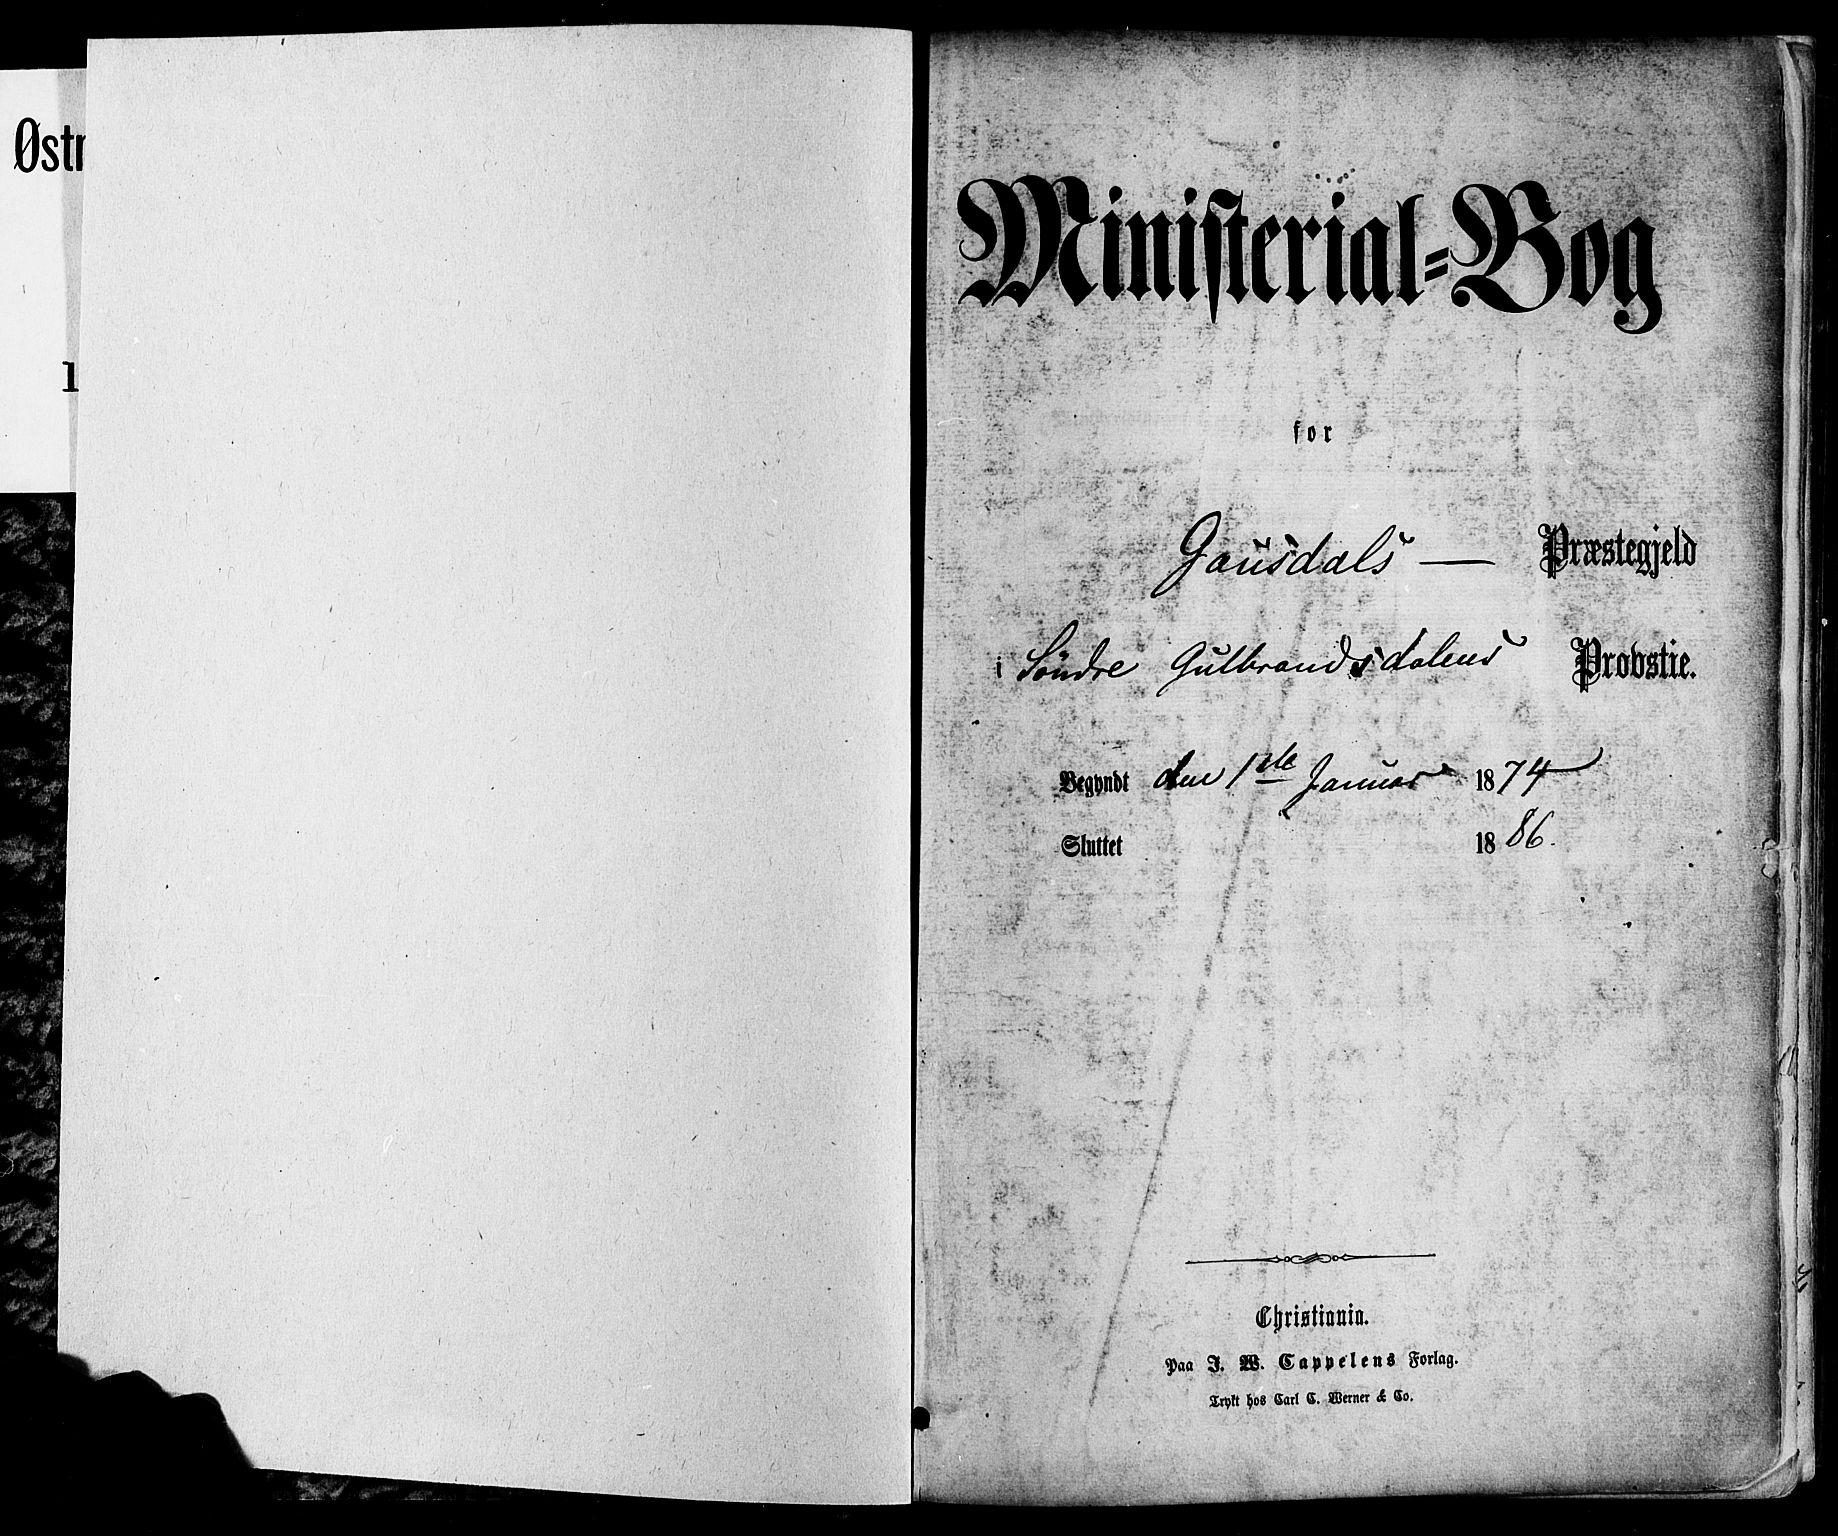 SAH, Østre Gausdal prestekontor, Ministerialbok nr. 1, 1874-1886